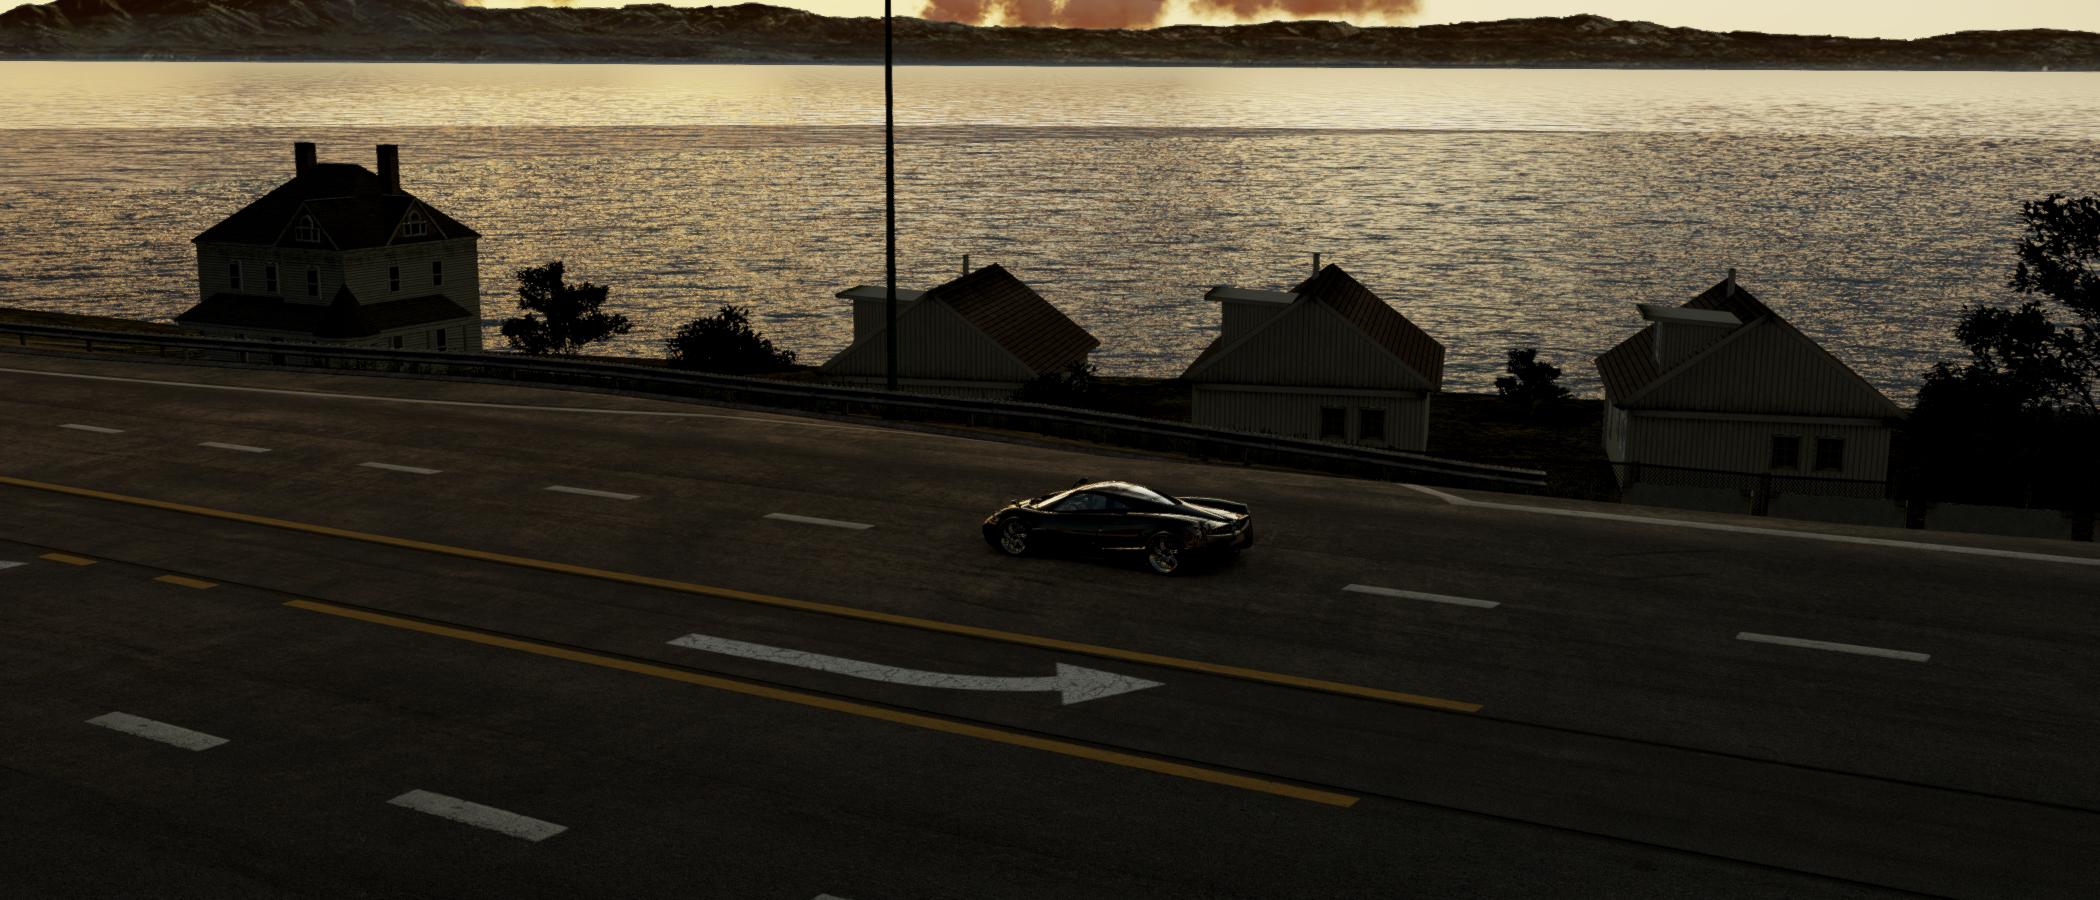 pcars2013-03-1814-43-d3qup.png